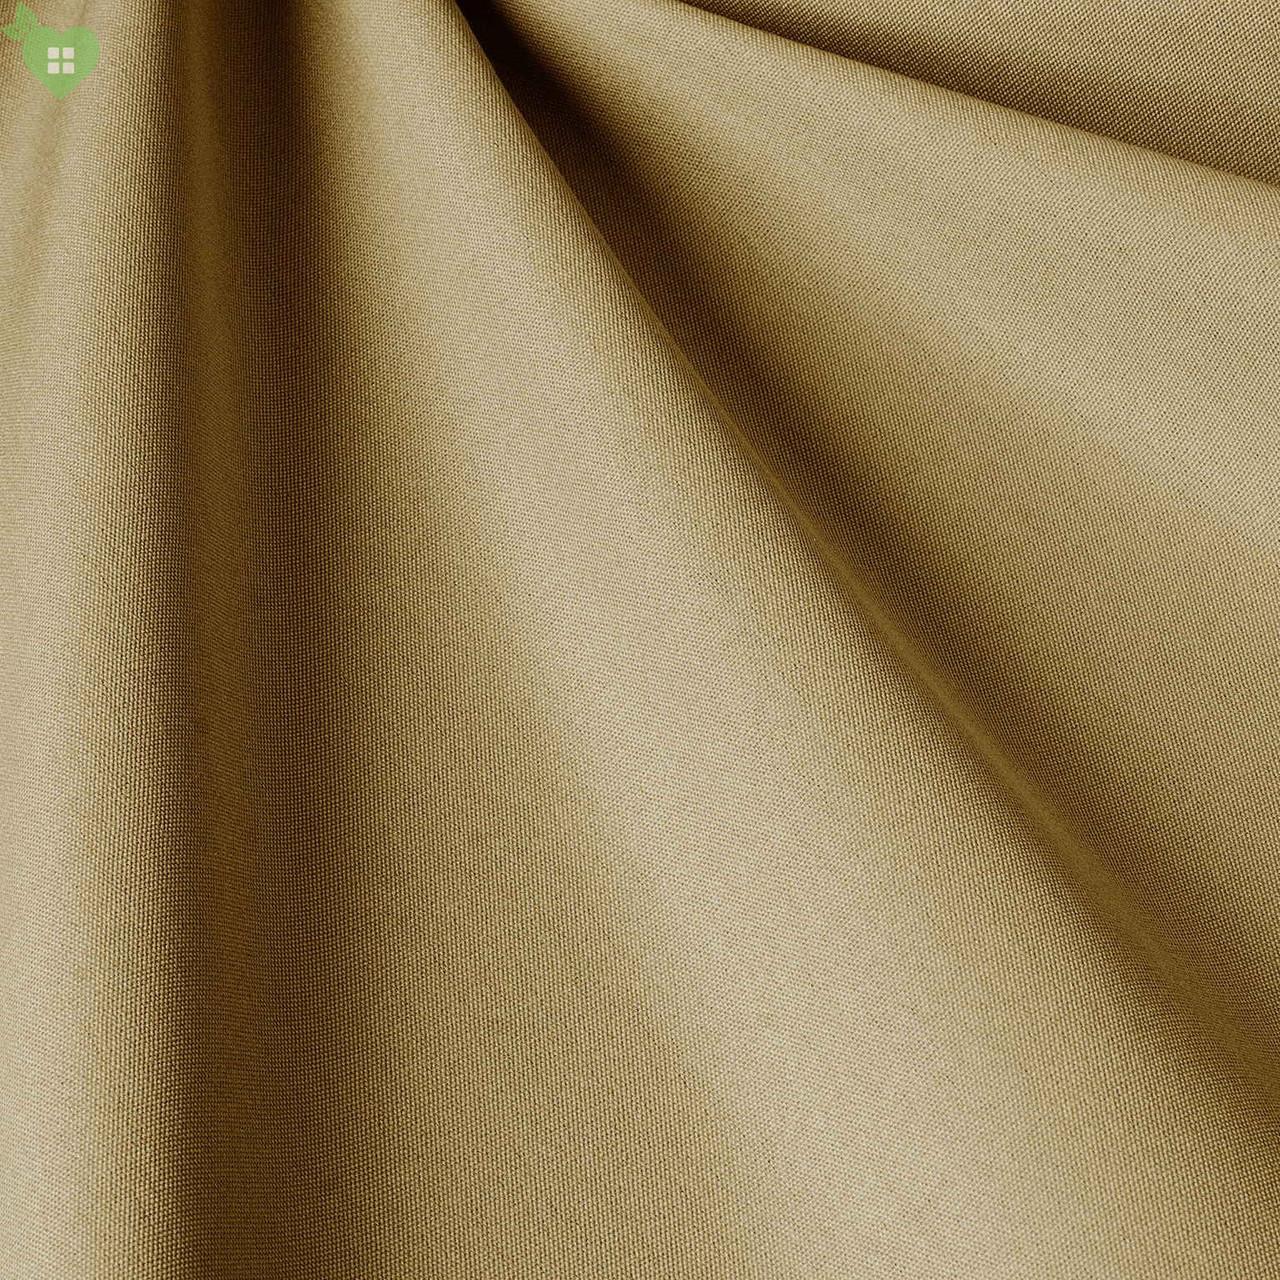 Ткань для улицы: Дралон (Outdoor) 400333v13